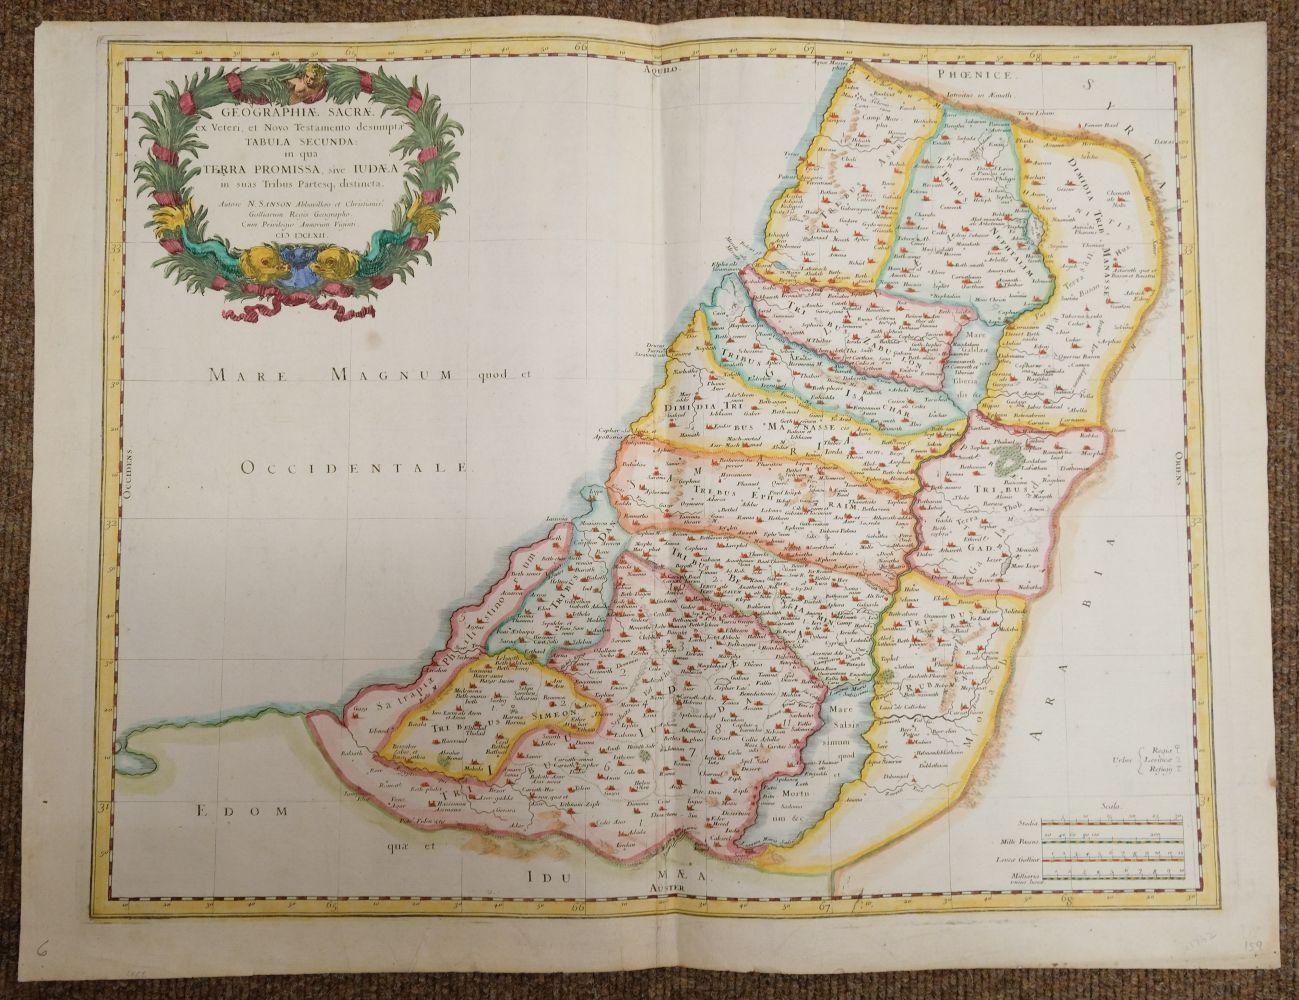 Holy Land. Ottens (R. & J.), Het Beloofde Landt Israels. Terra Sancta..., Amsterdam, circa 1765 - Image 3 of 10